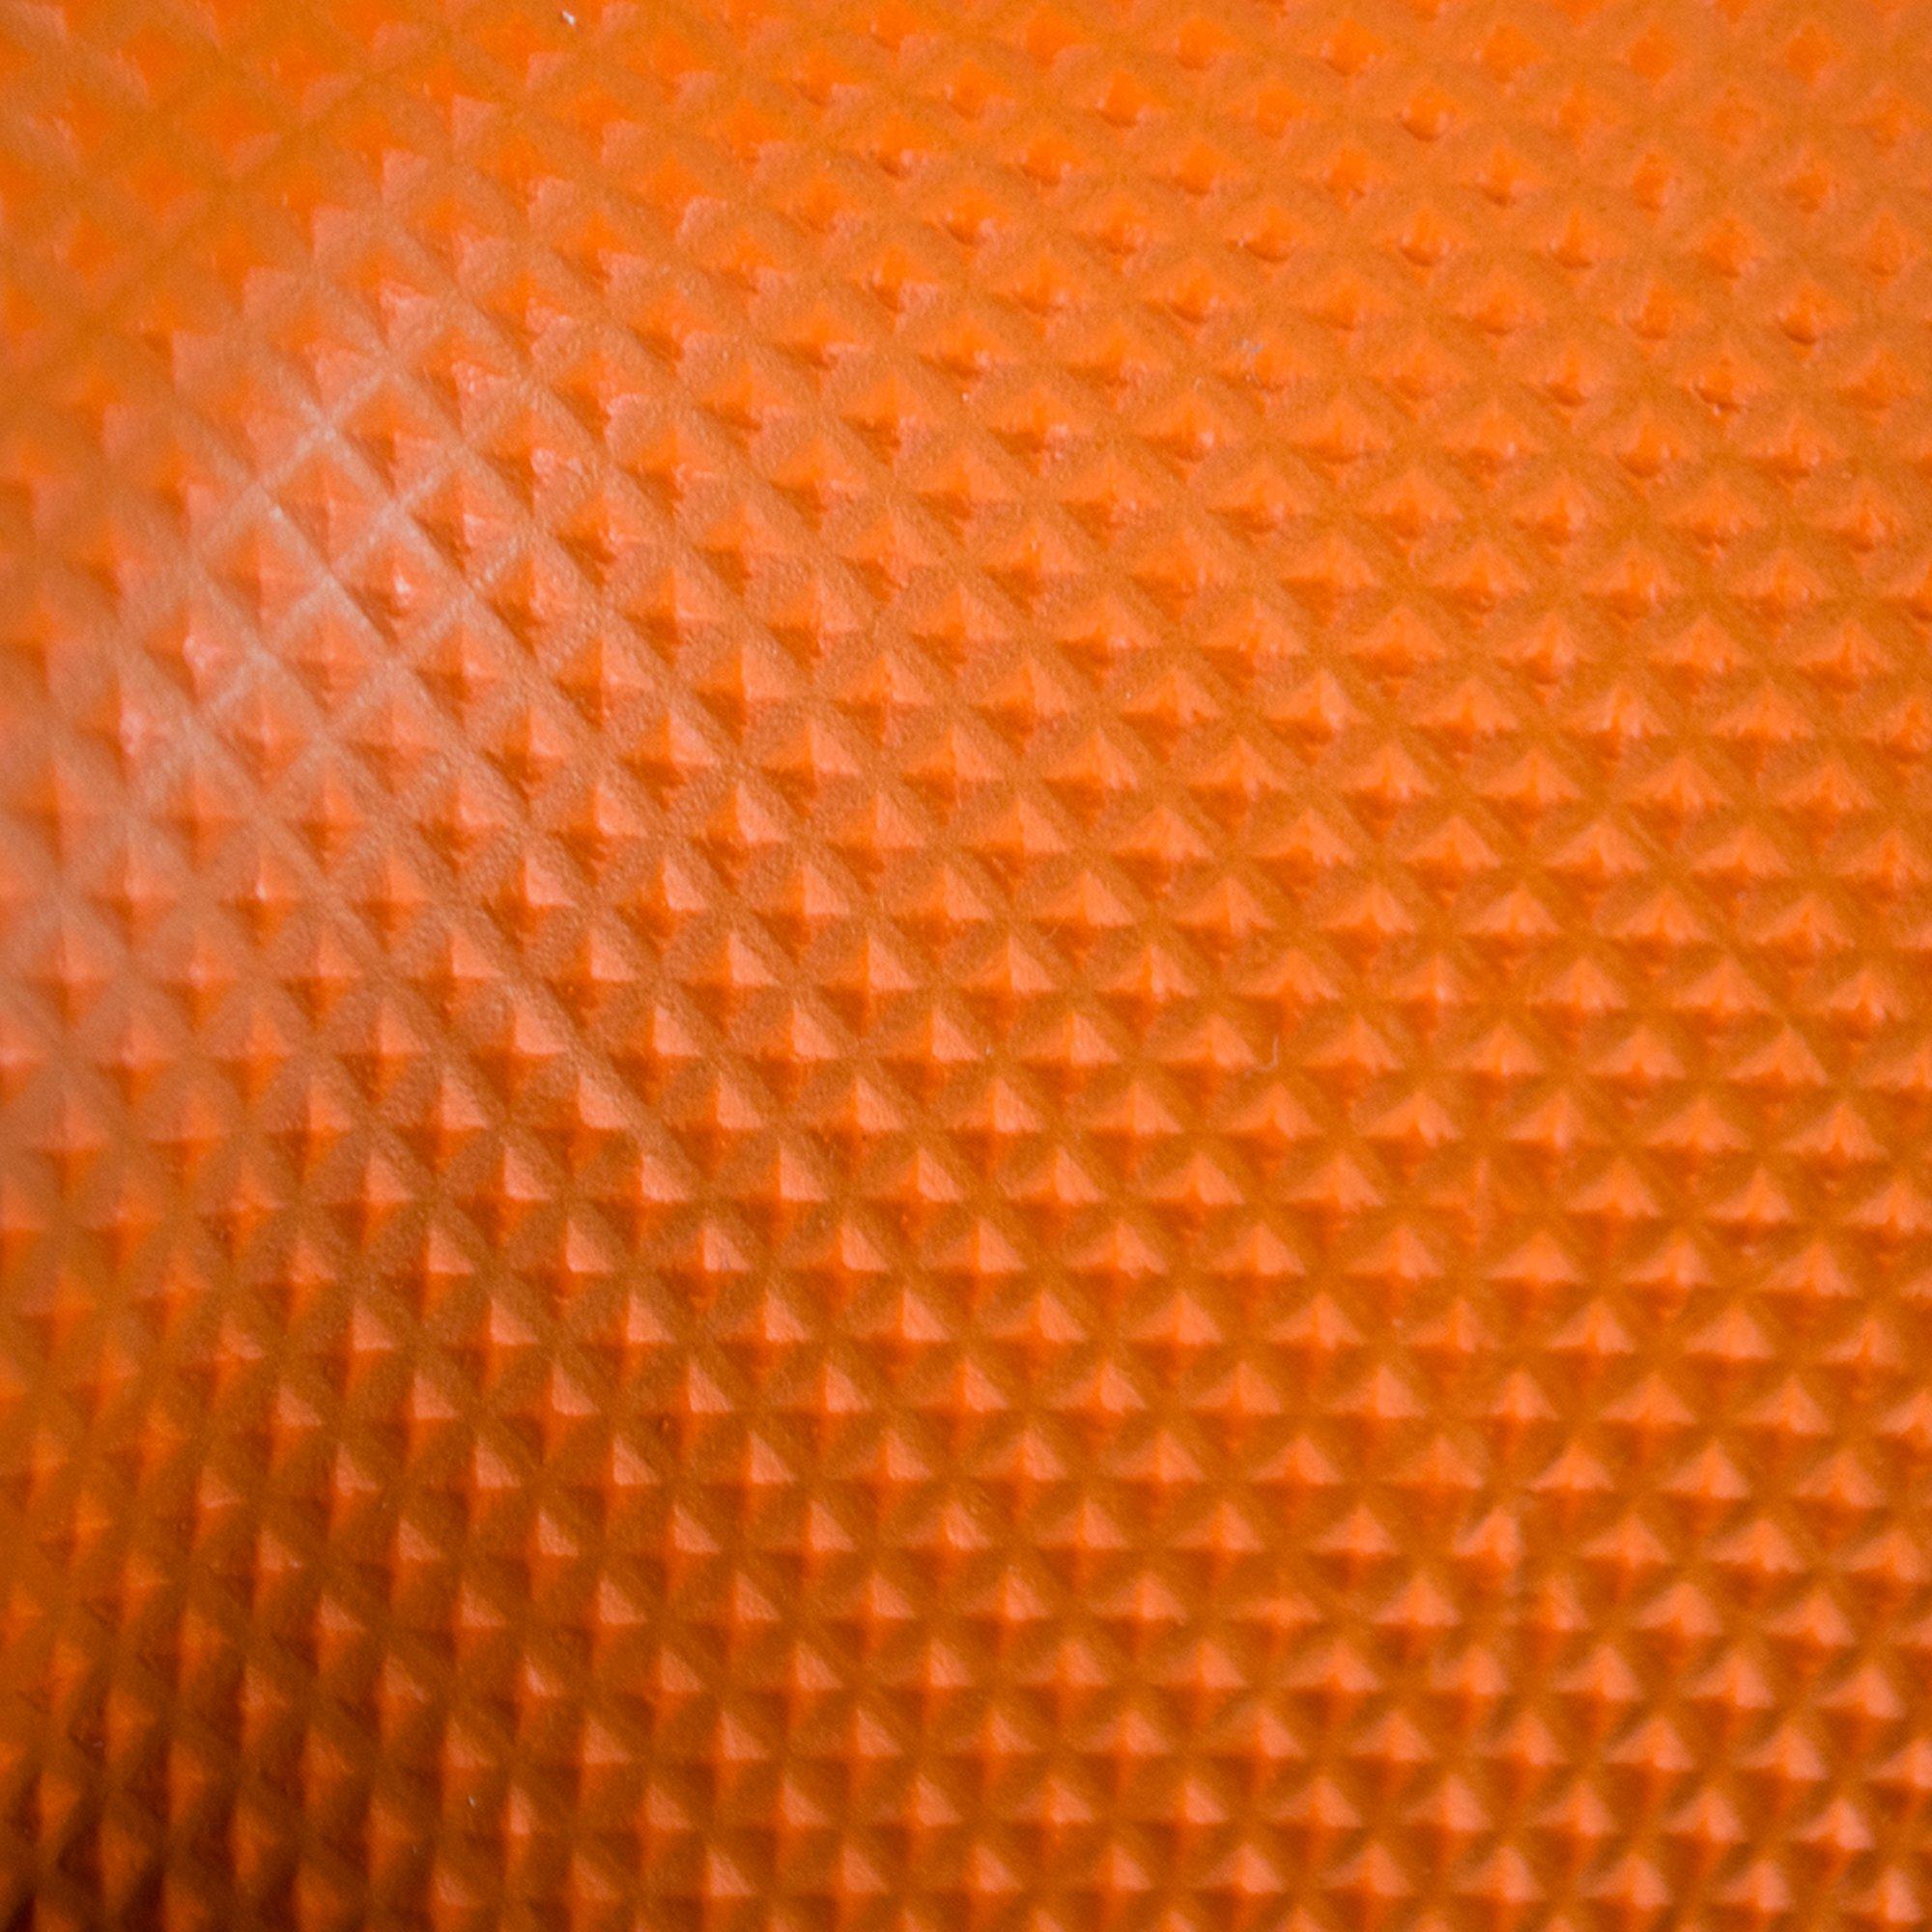 SupplyMaster - SMDTON8M - Diamond Texture Nitrile Gloves - Disposable, Powder Free, Industrial, 8 mil, Medium, Orange (Case of 200) by SupplyMaster (Image #2)